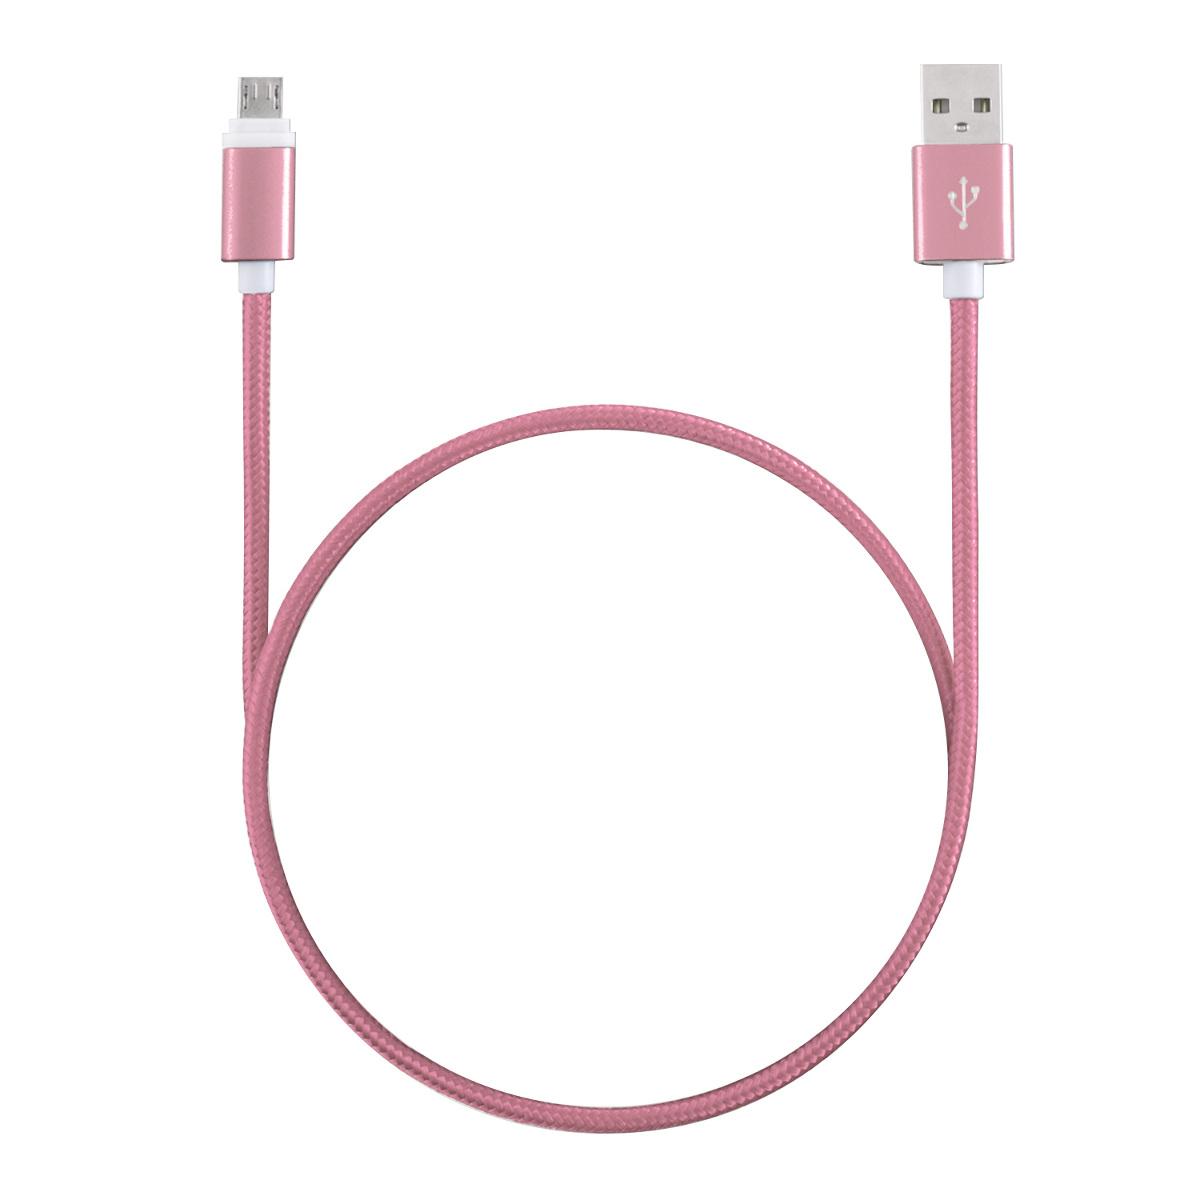 kwmobile-Nylon-Micro-USB-charging-cable-for-Samsung-HTC-LG-1-m-Motorola